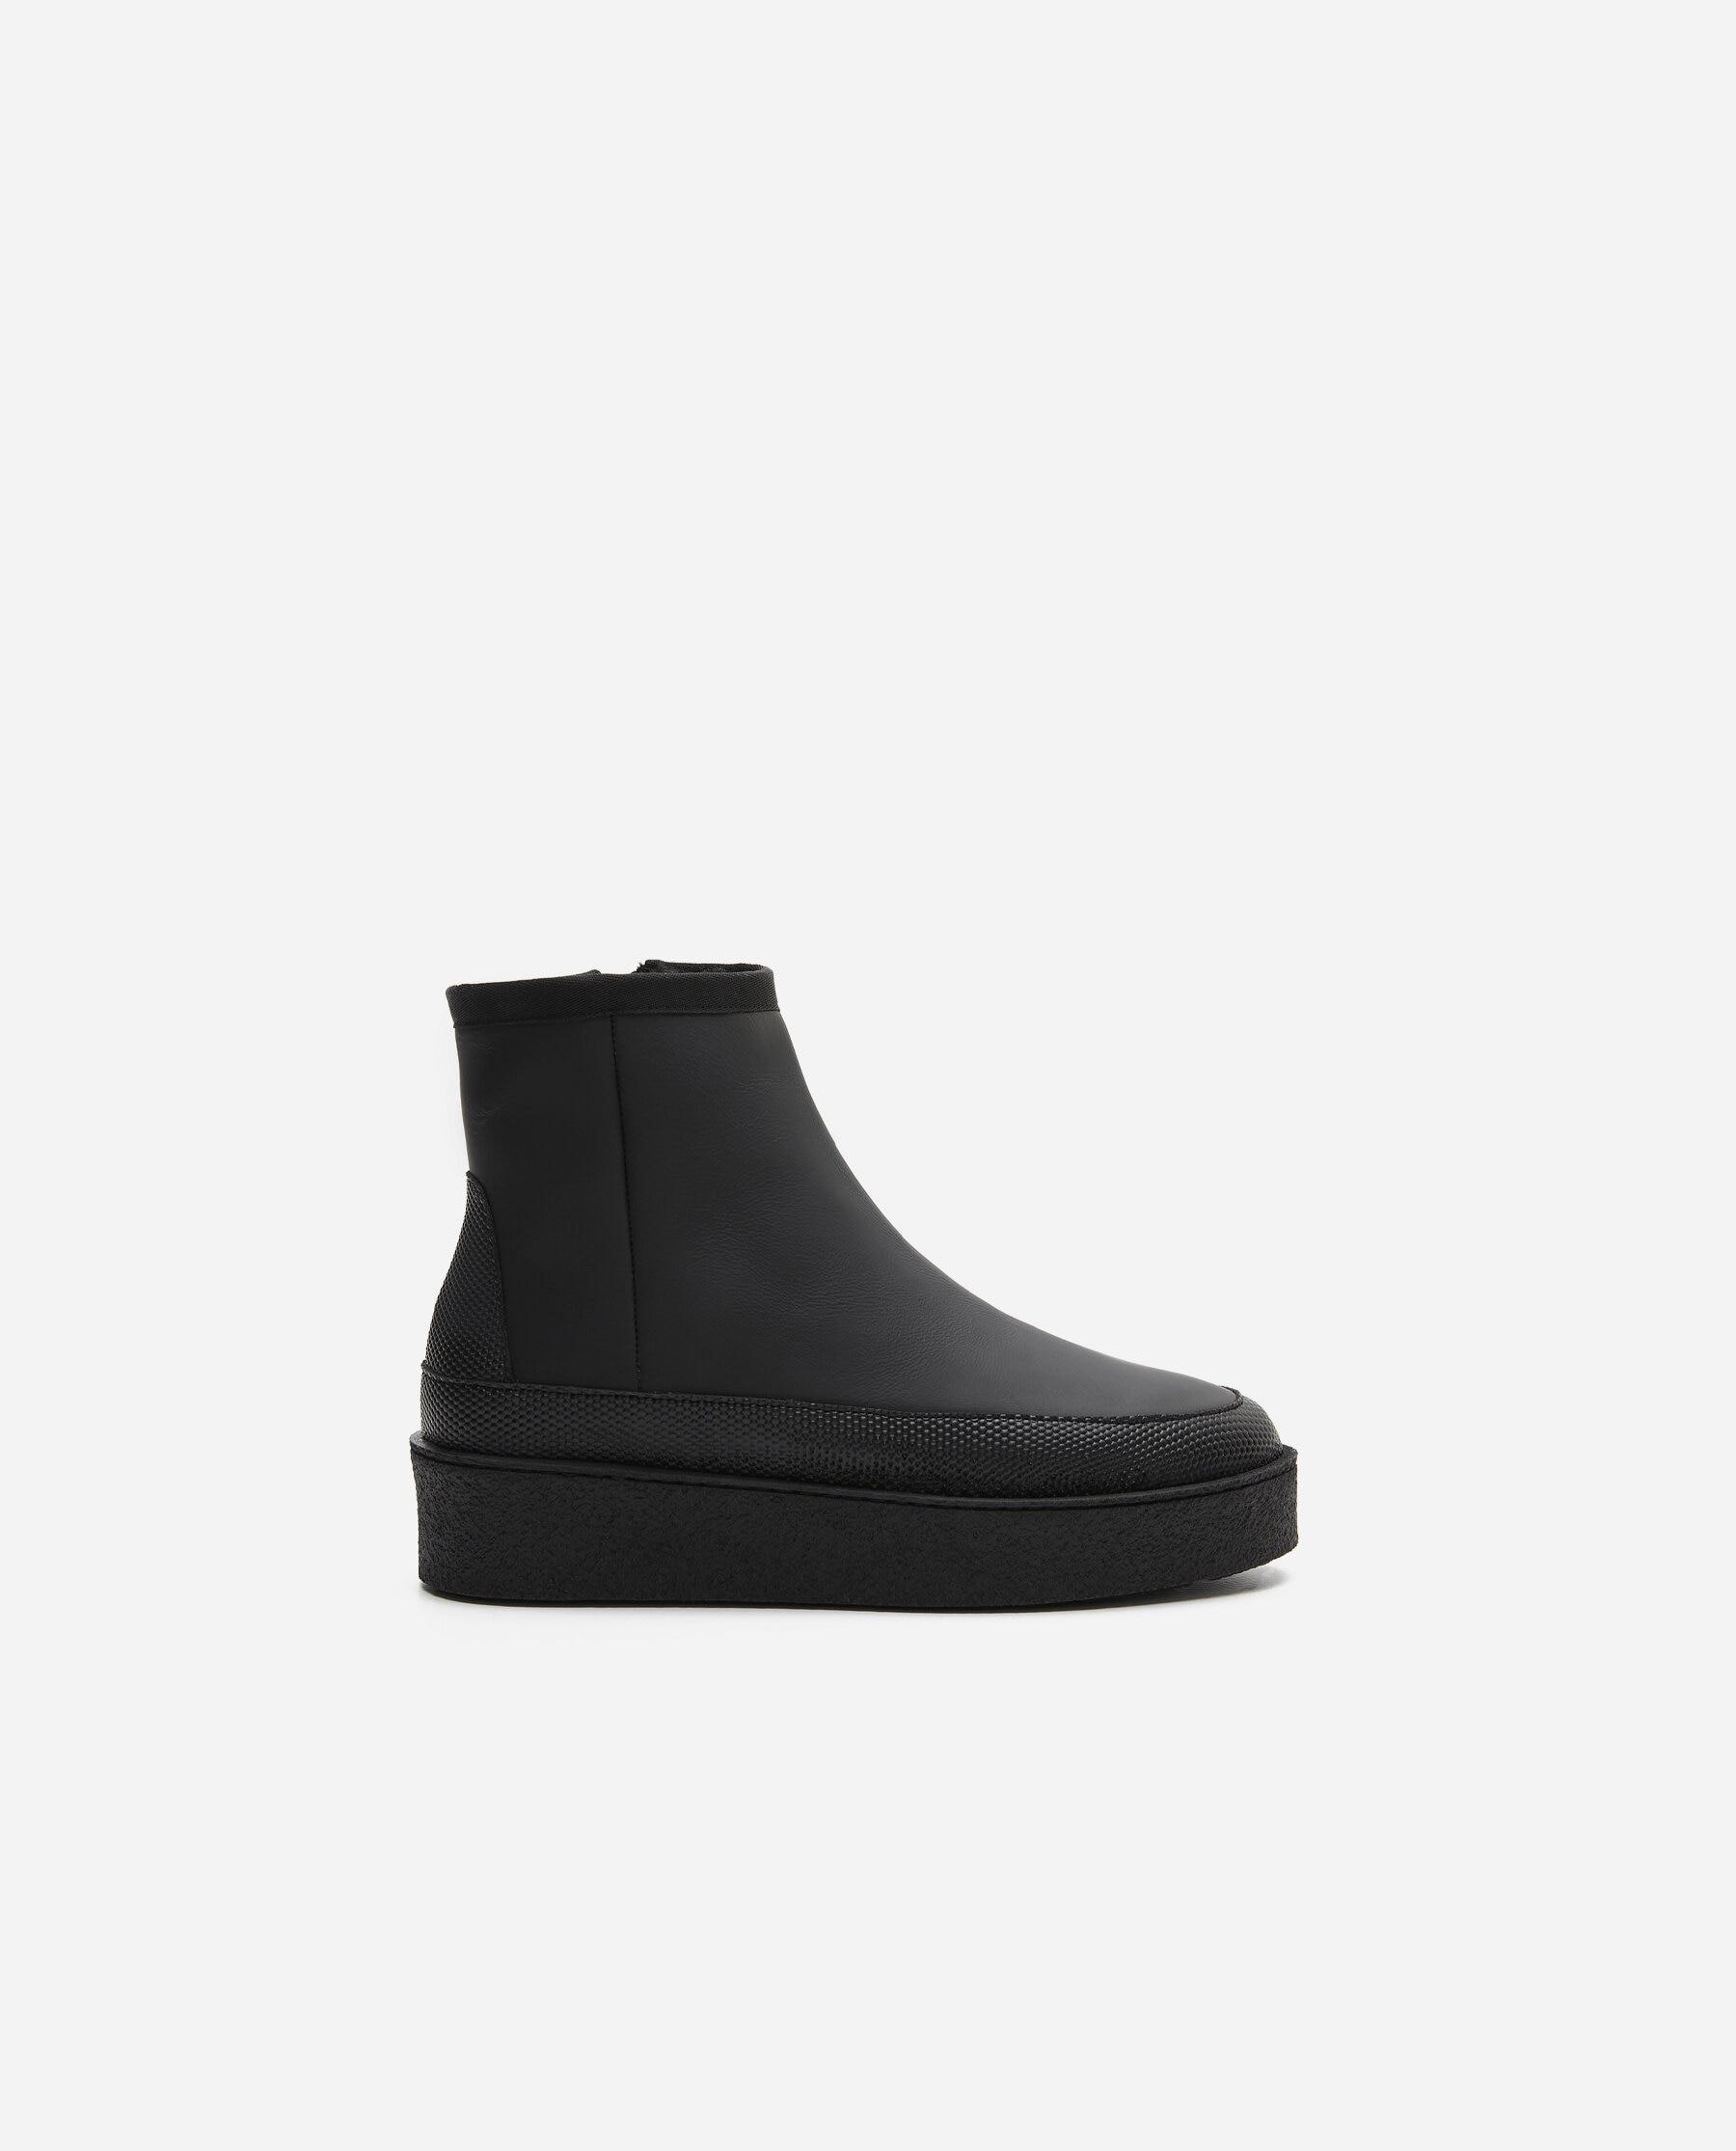 Aria Coated Leather Black